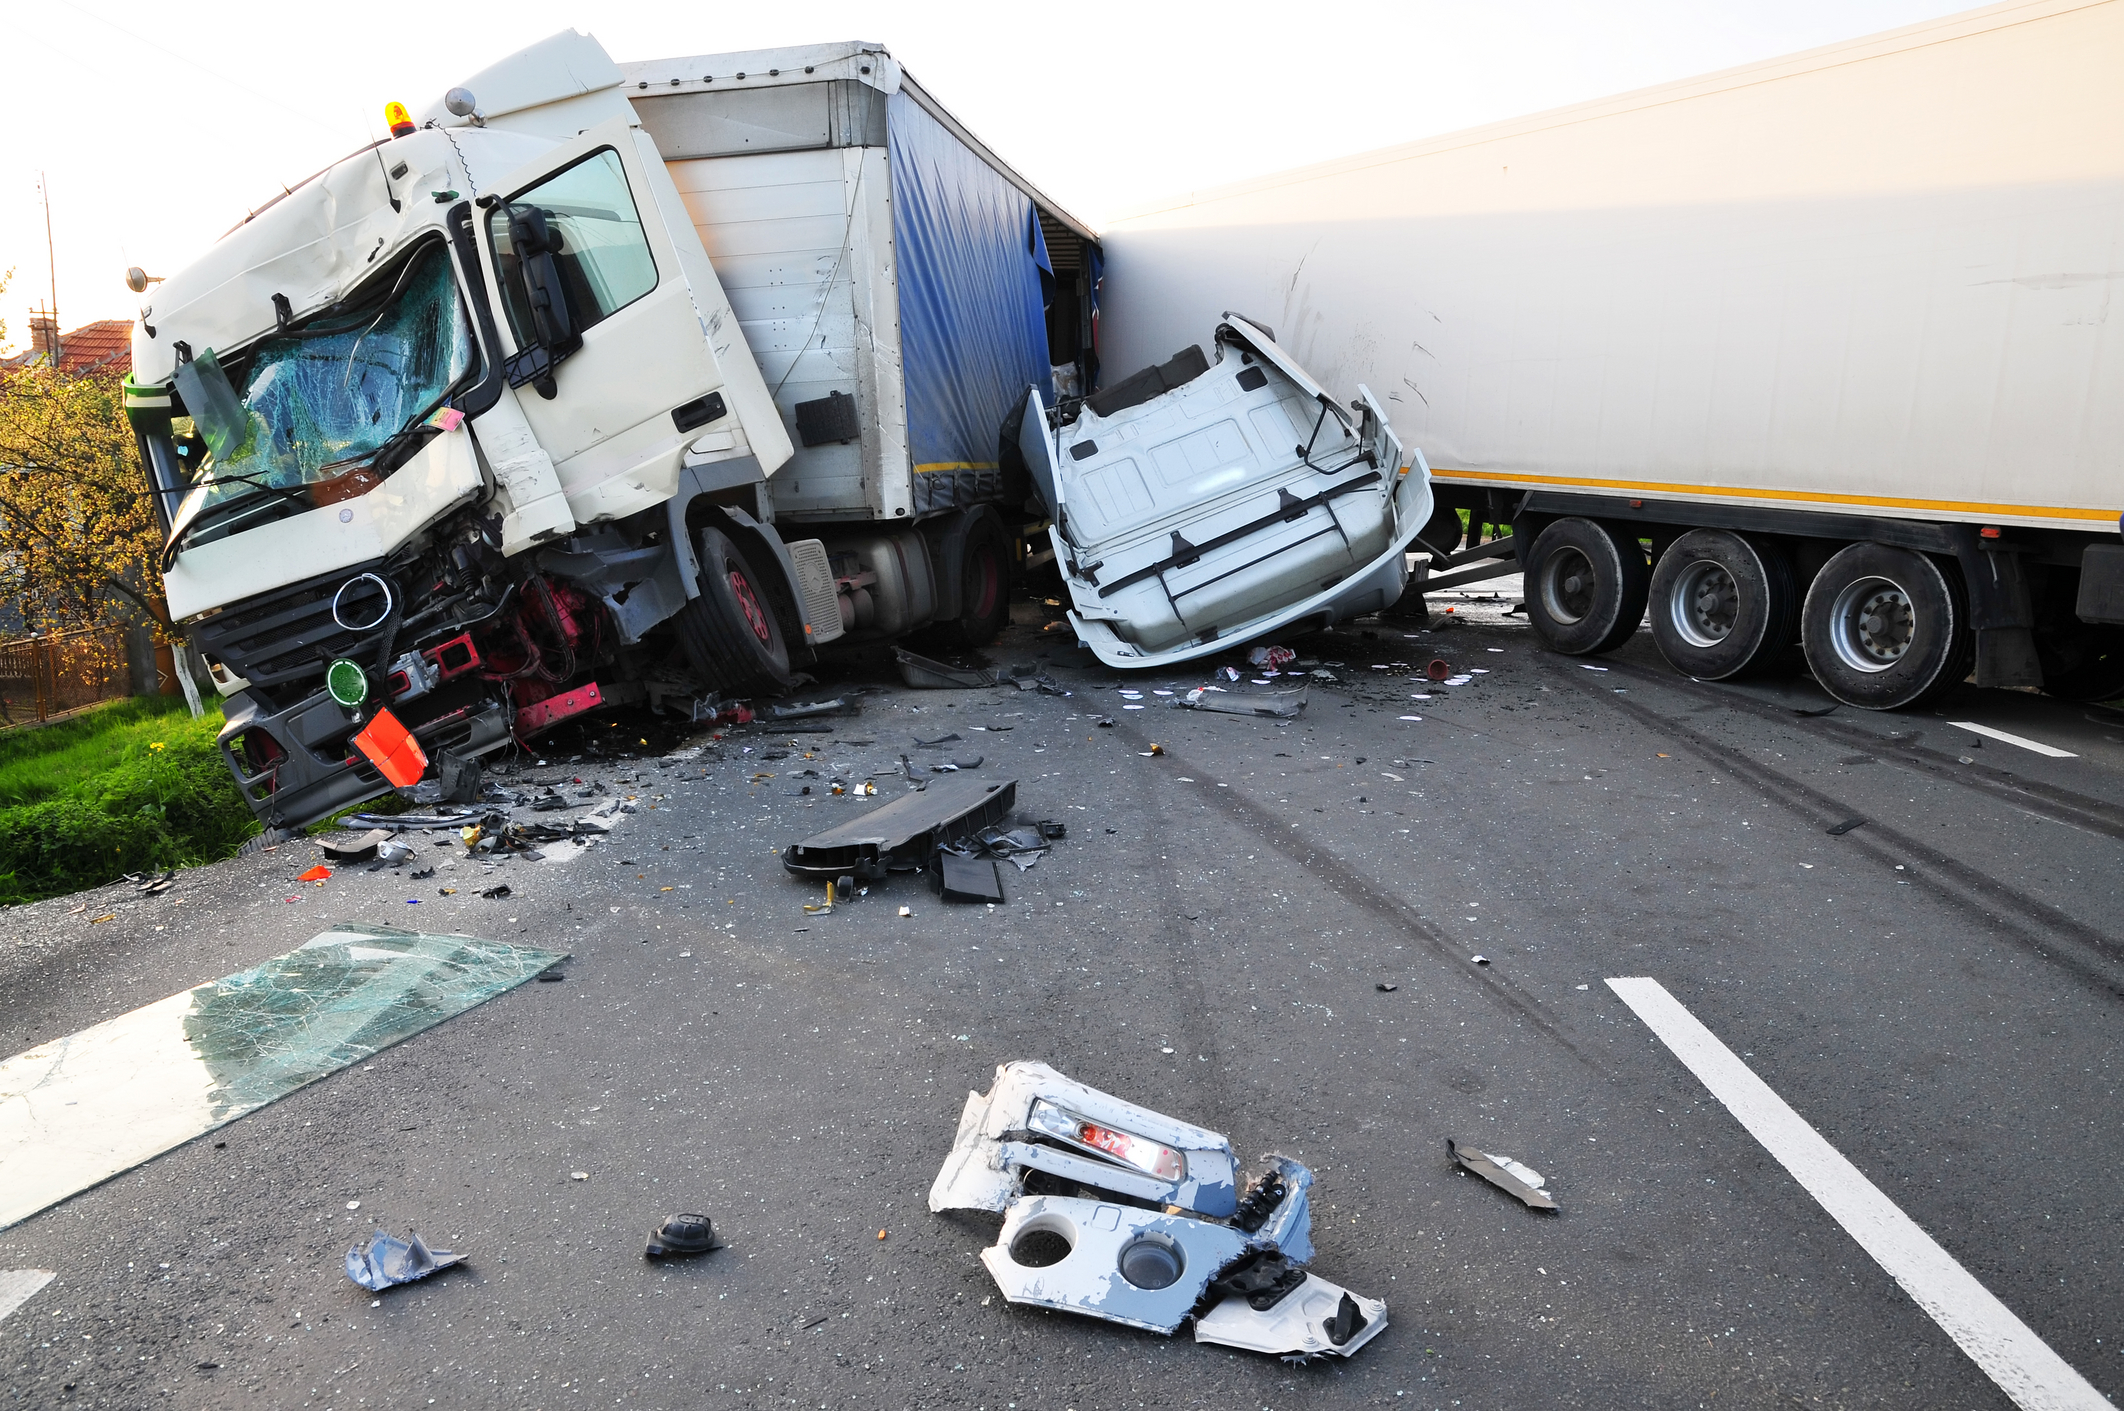 https://i2.wp.com/lerablog.org/wp-content/uploads/2013/08/lorry-accident.jpg